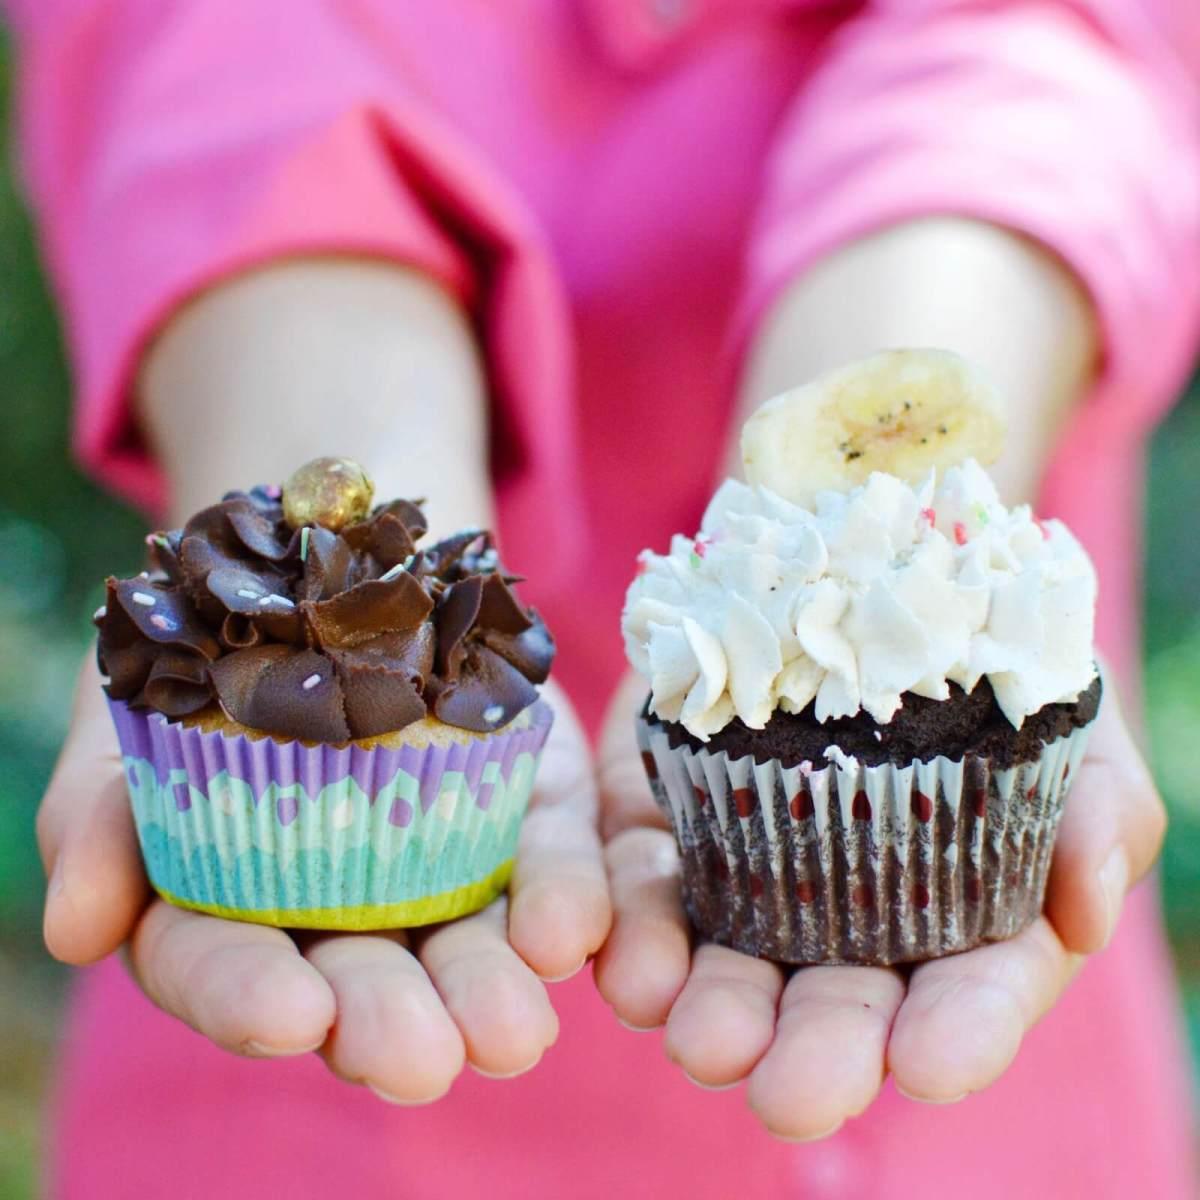 cupcakes vegan jo and nana cakes